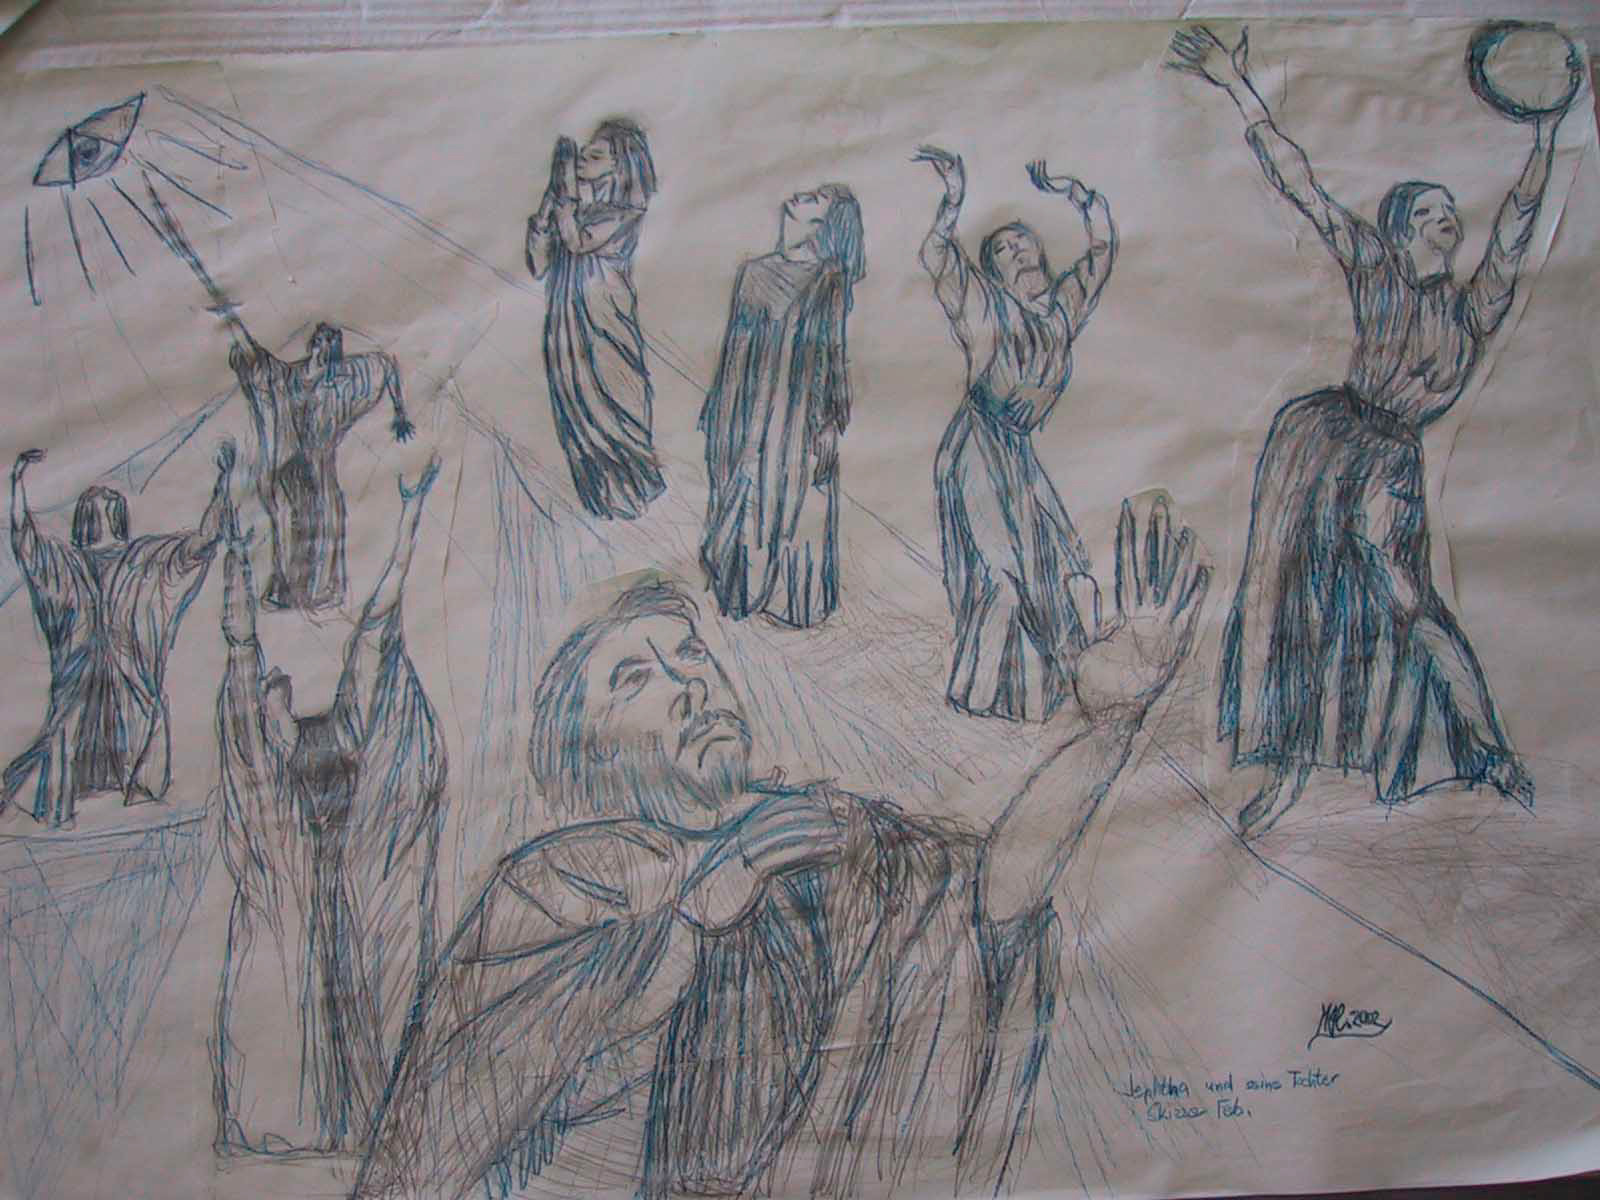 Bibel-Tanz der Elfta-Skizze